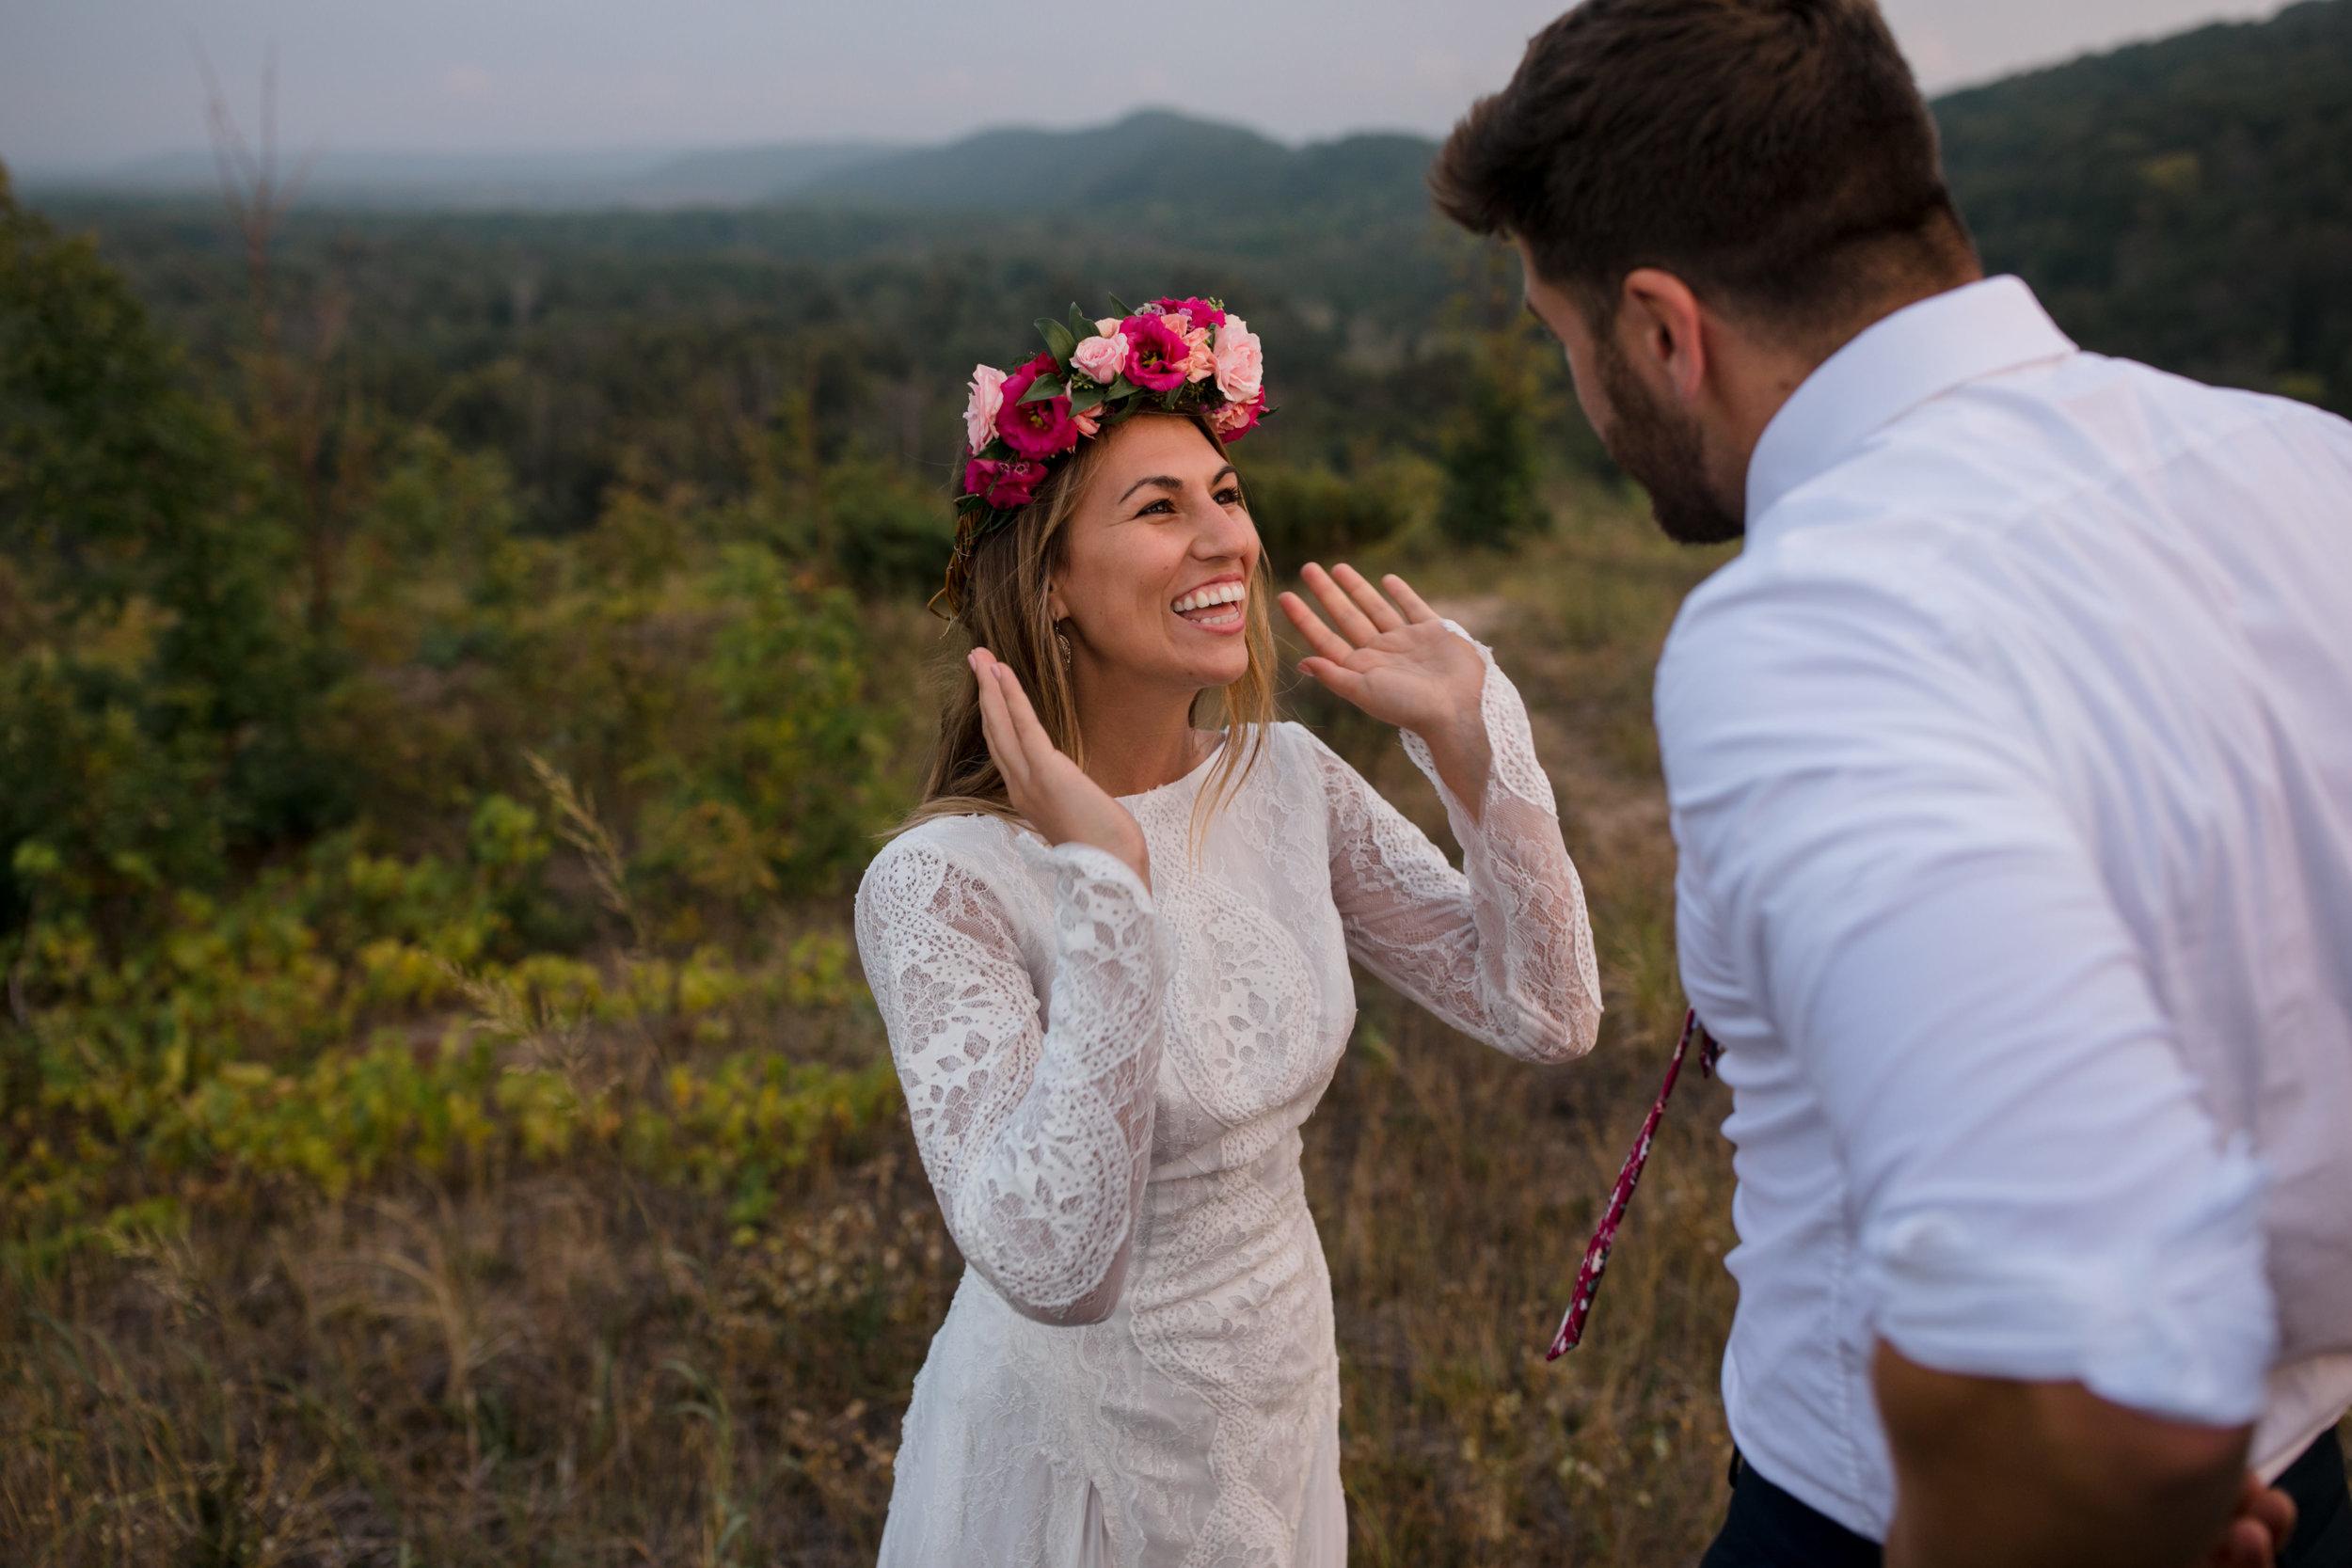 michigan-emotive-photographer-moonlight-elopement-mariha-hunter-118.jpg